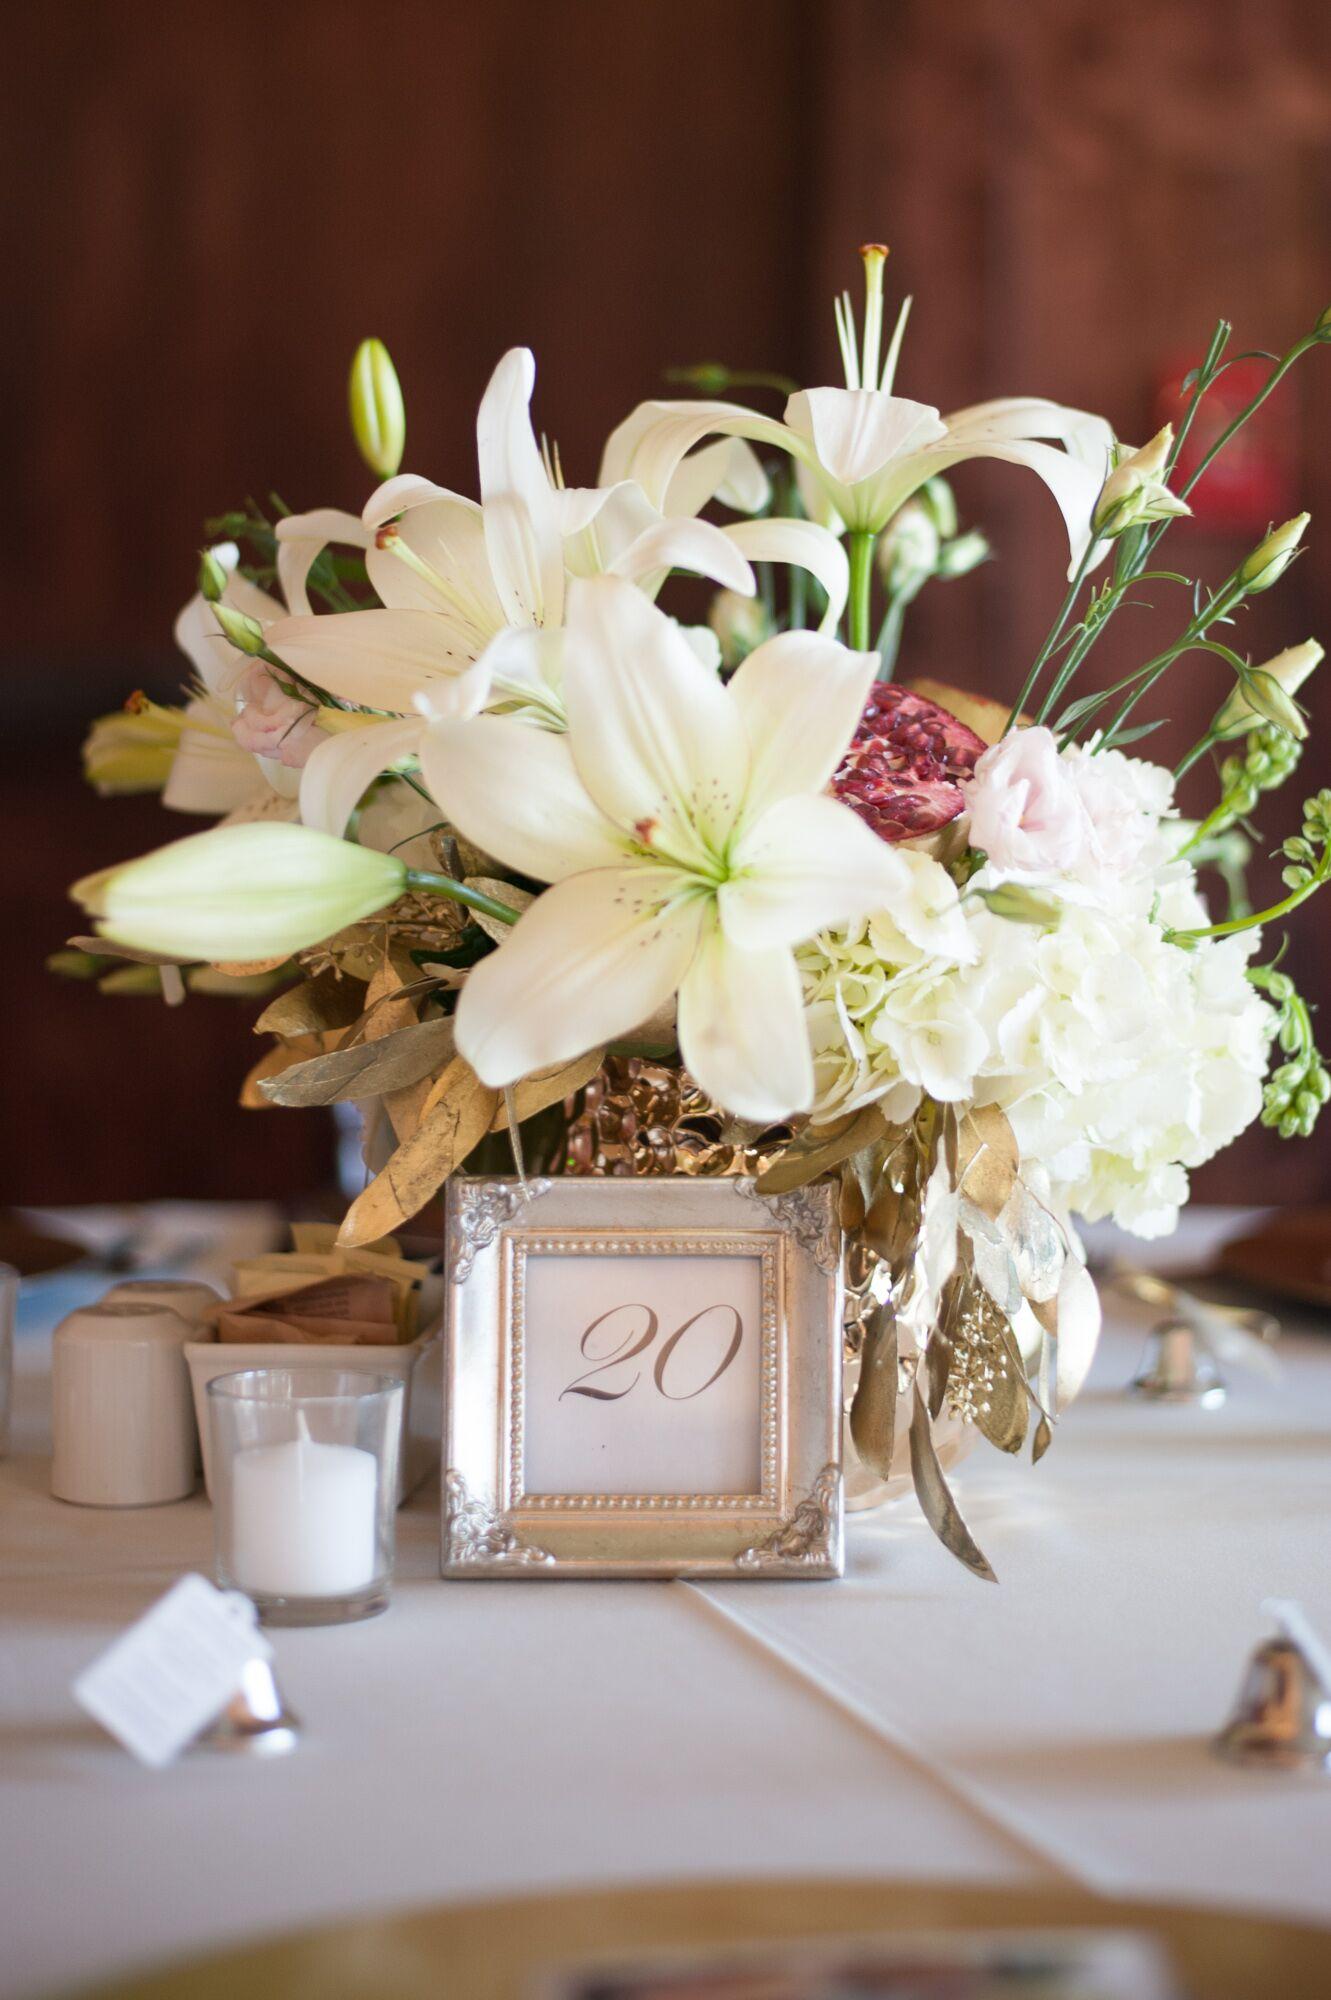 White lily hydrangea centerpieces